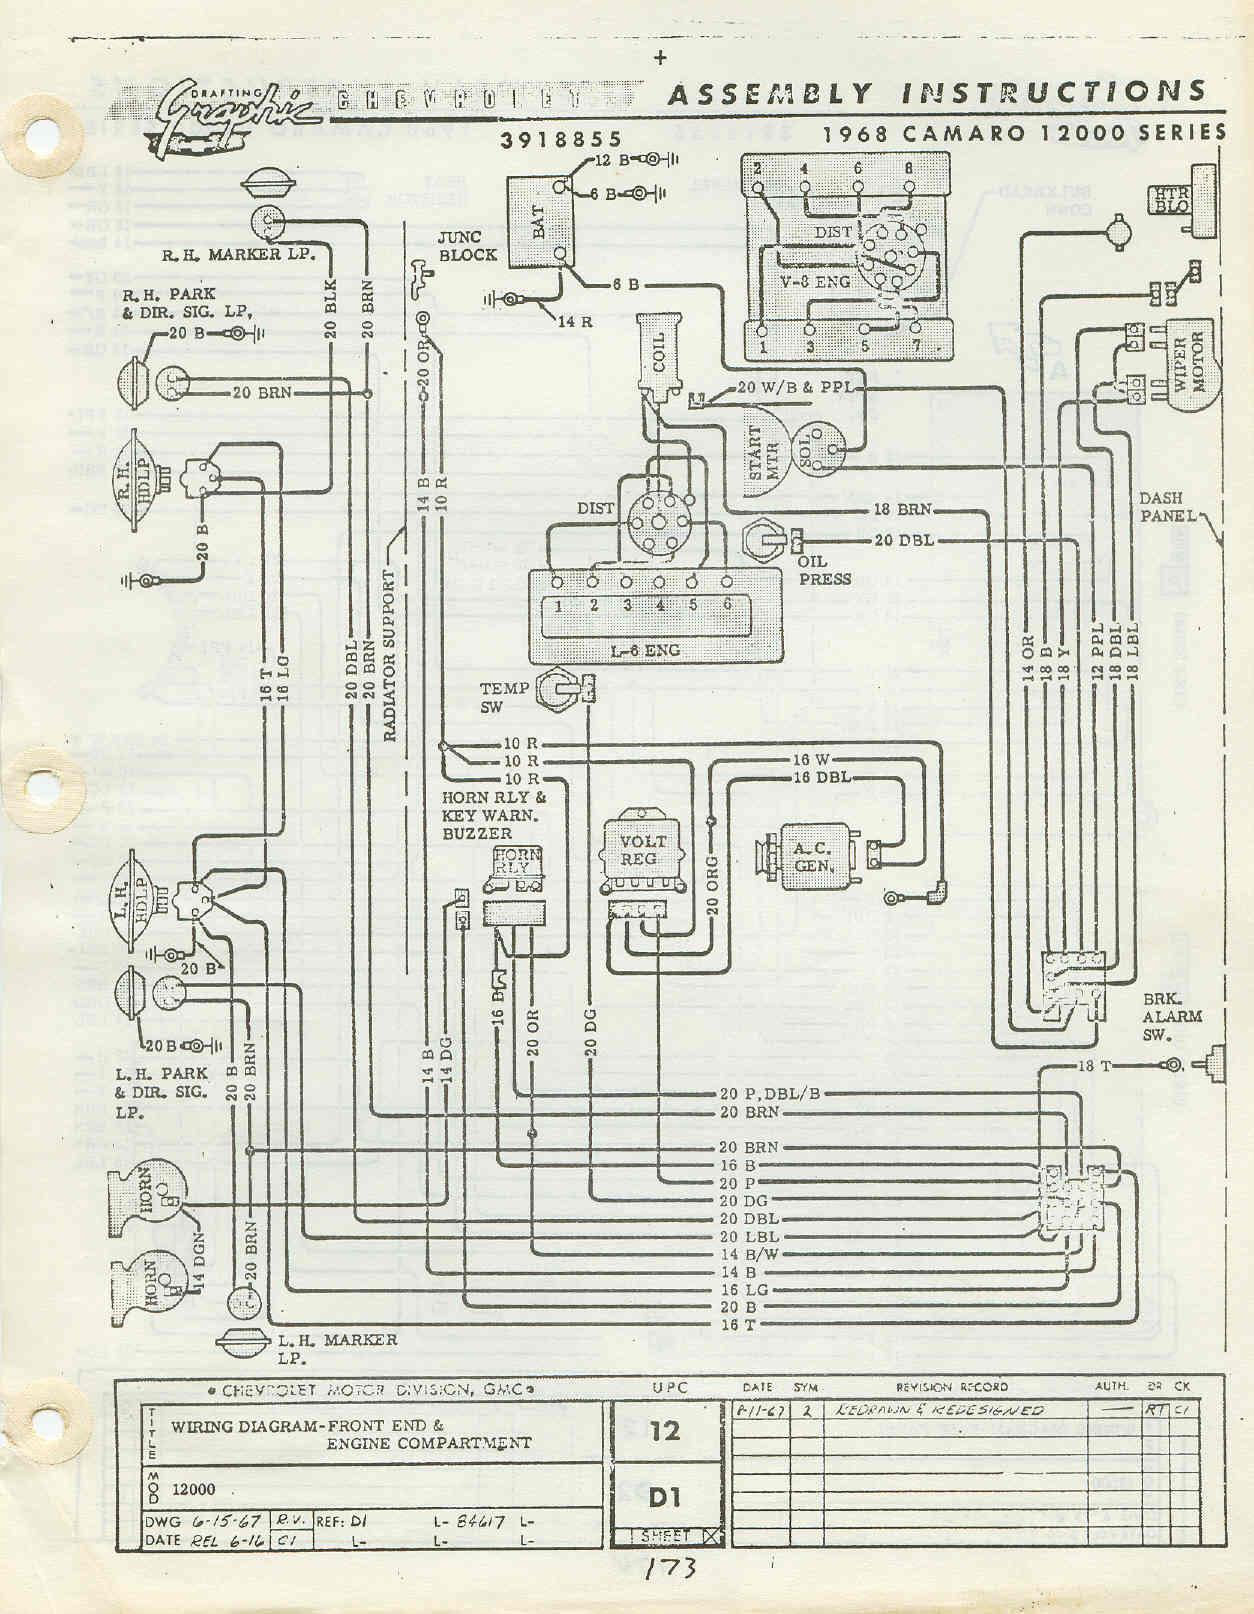 1968 camaro wiring harness diagram image 3